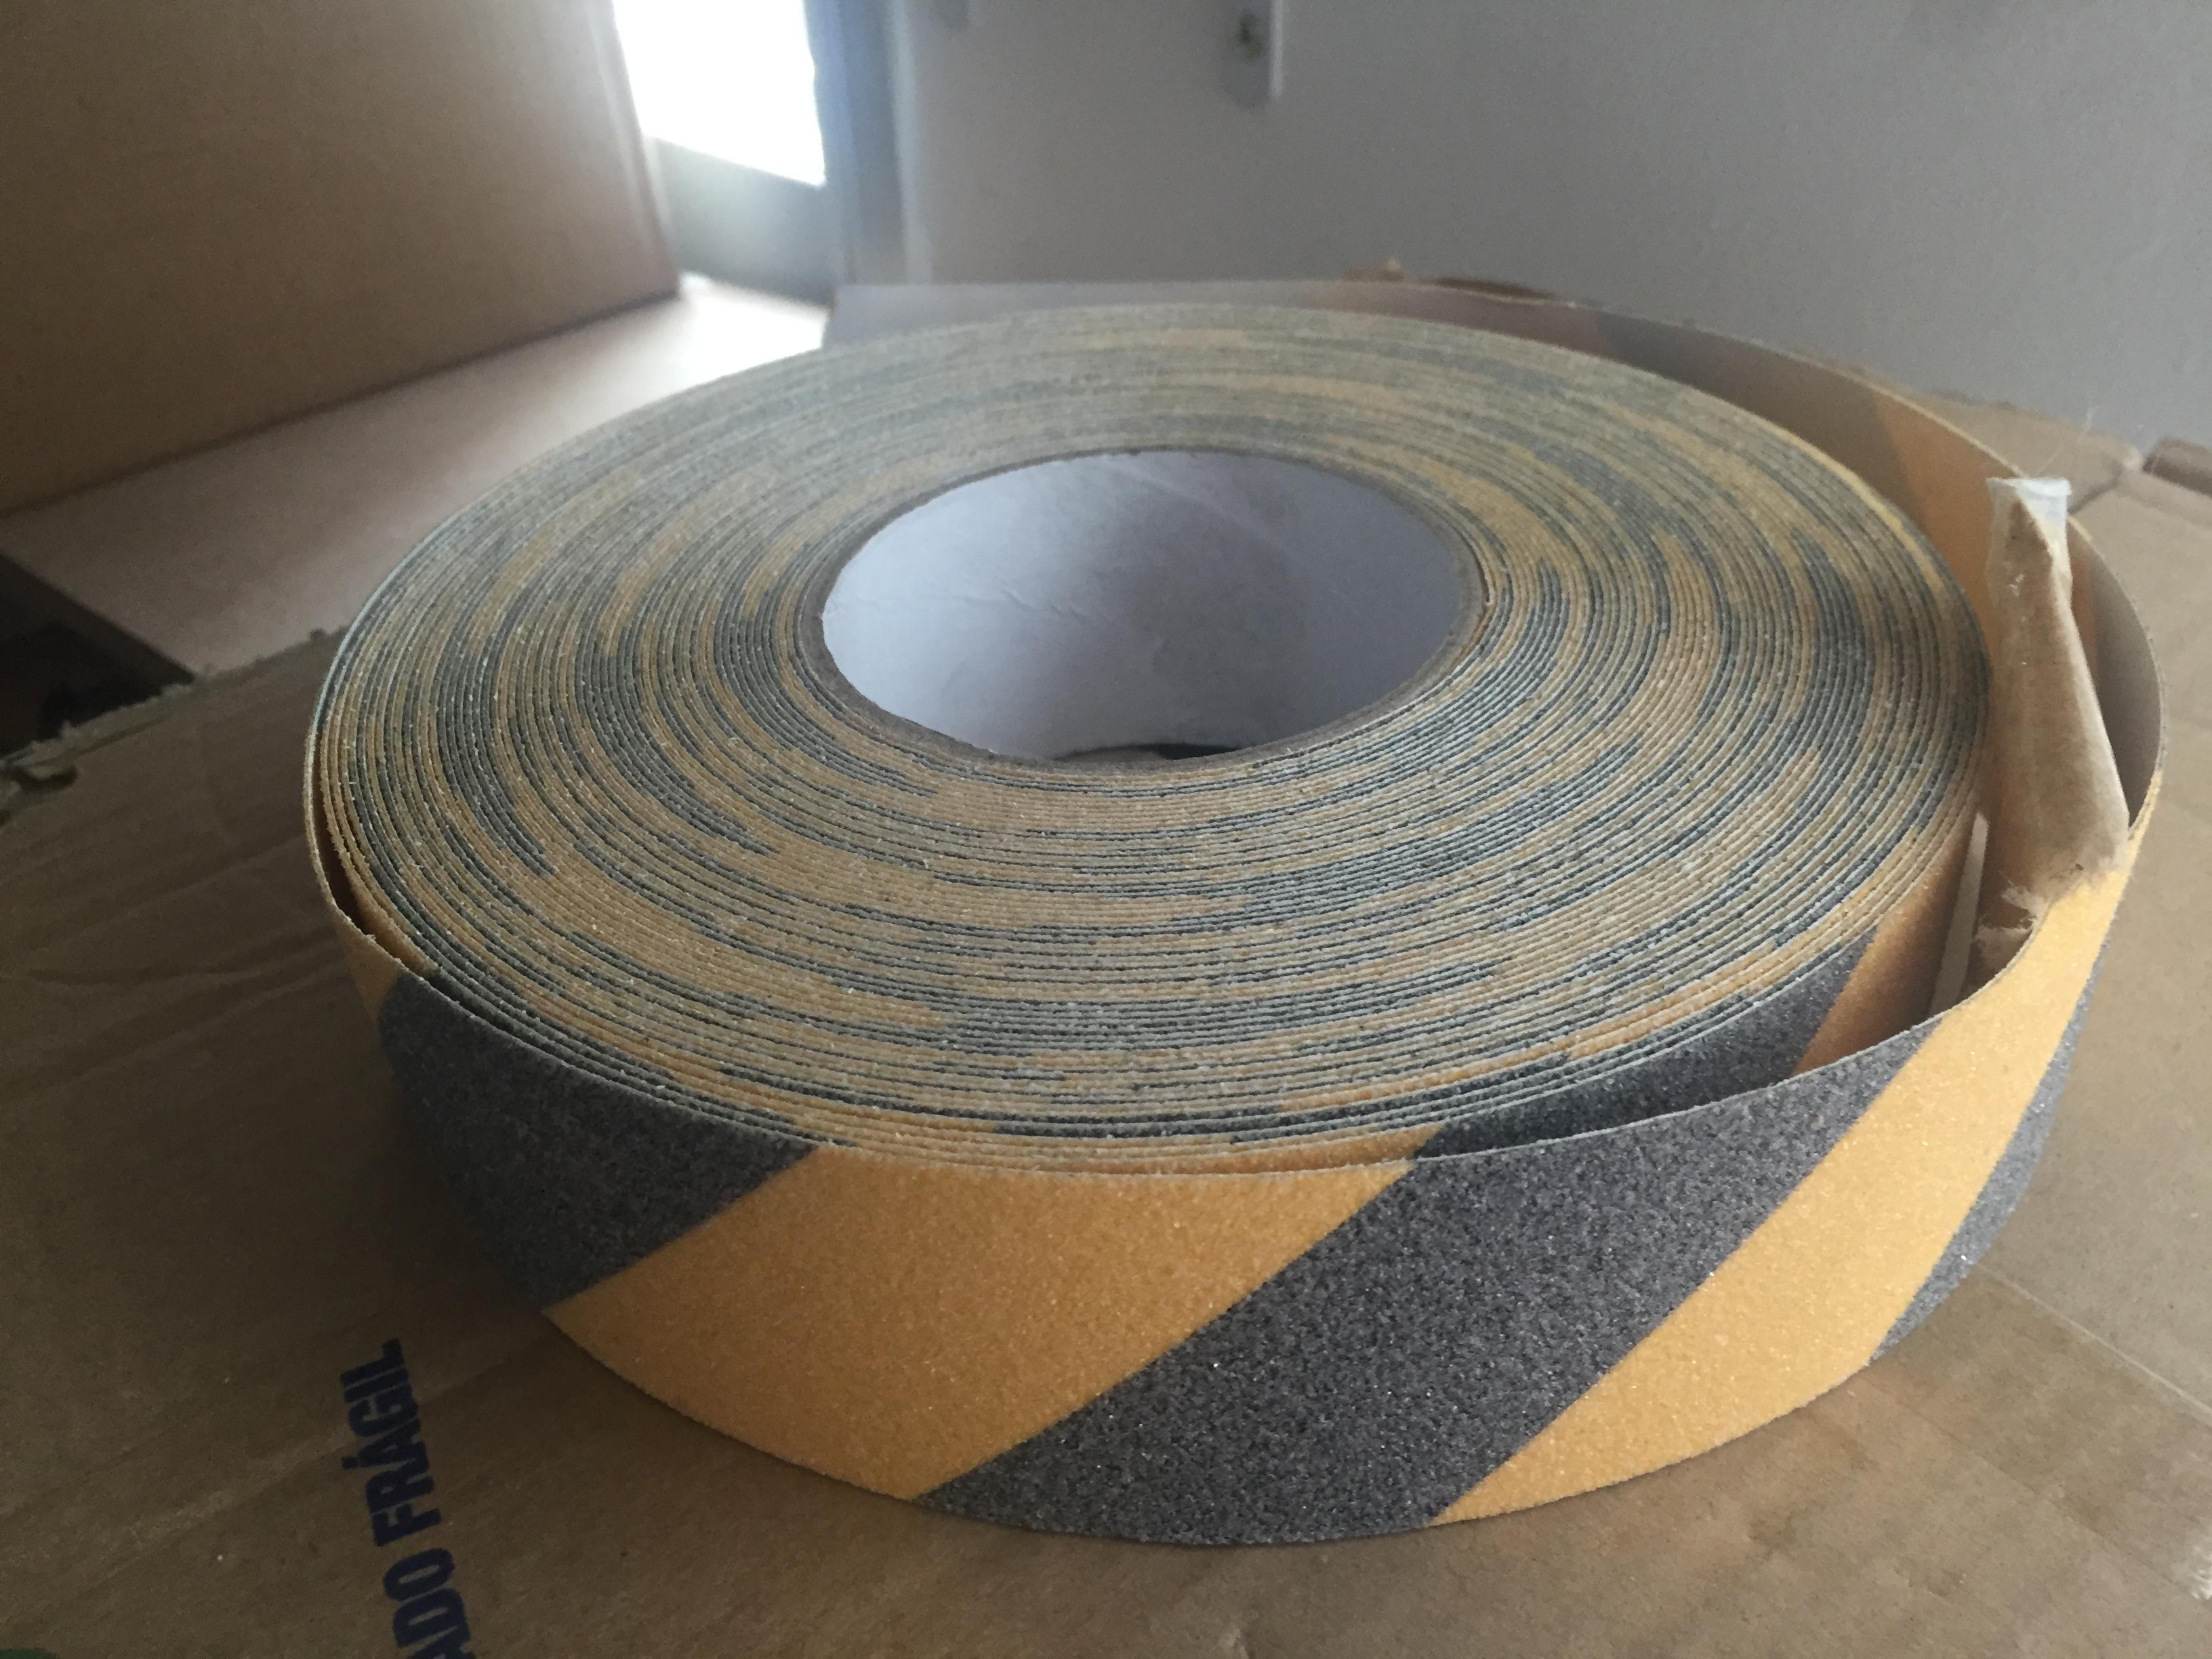 Fita Adesiva Antiderrapante Escada Cor Preto e Amarelo Zebrado - Rolo de 30 Mts